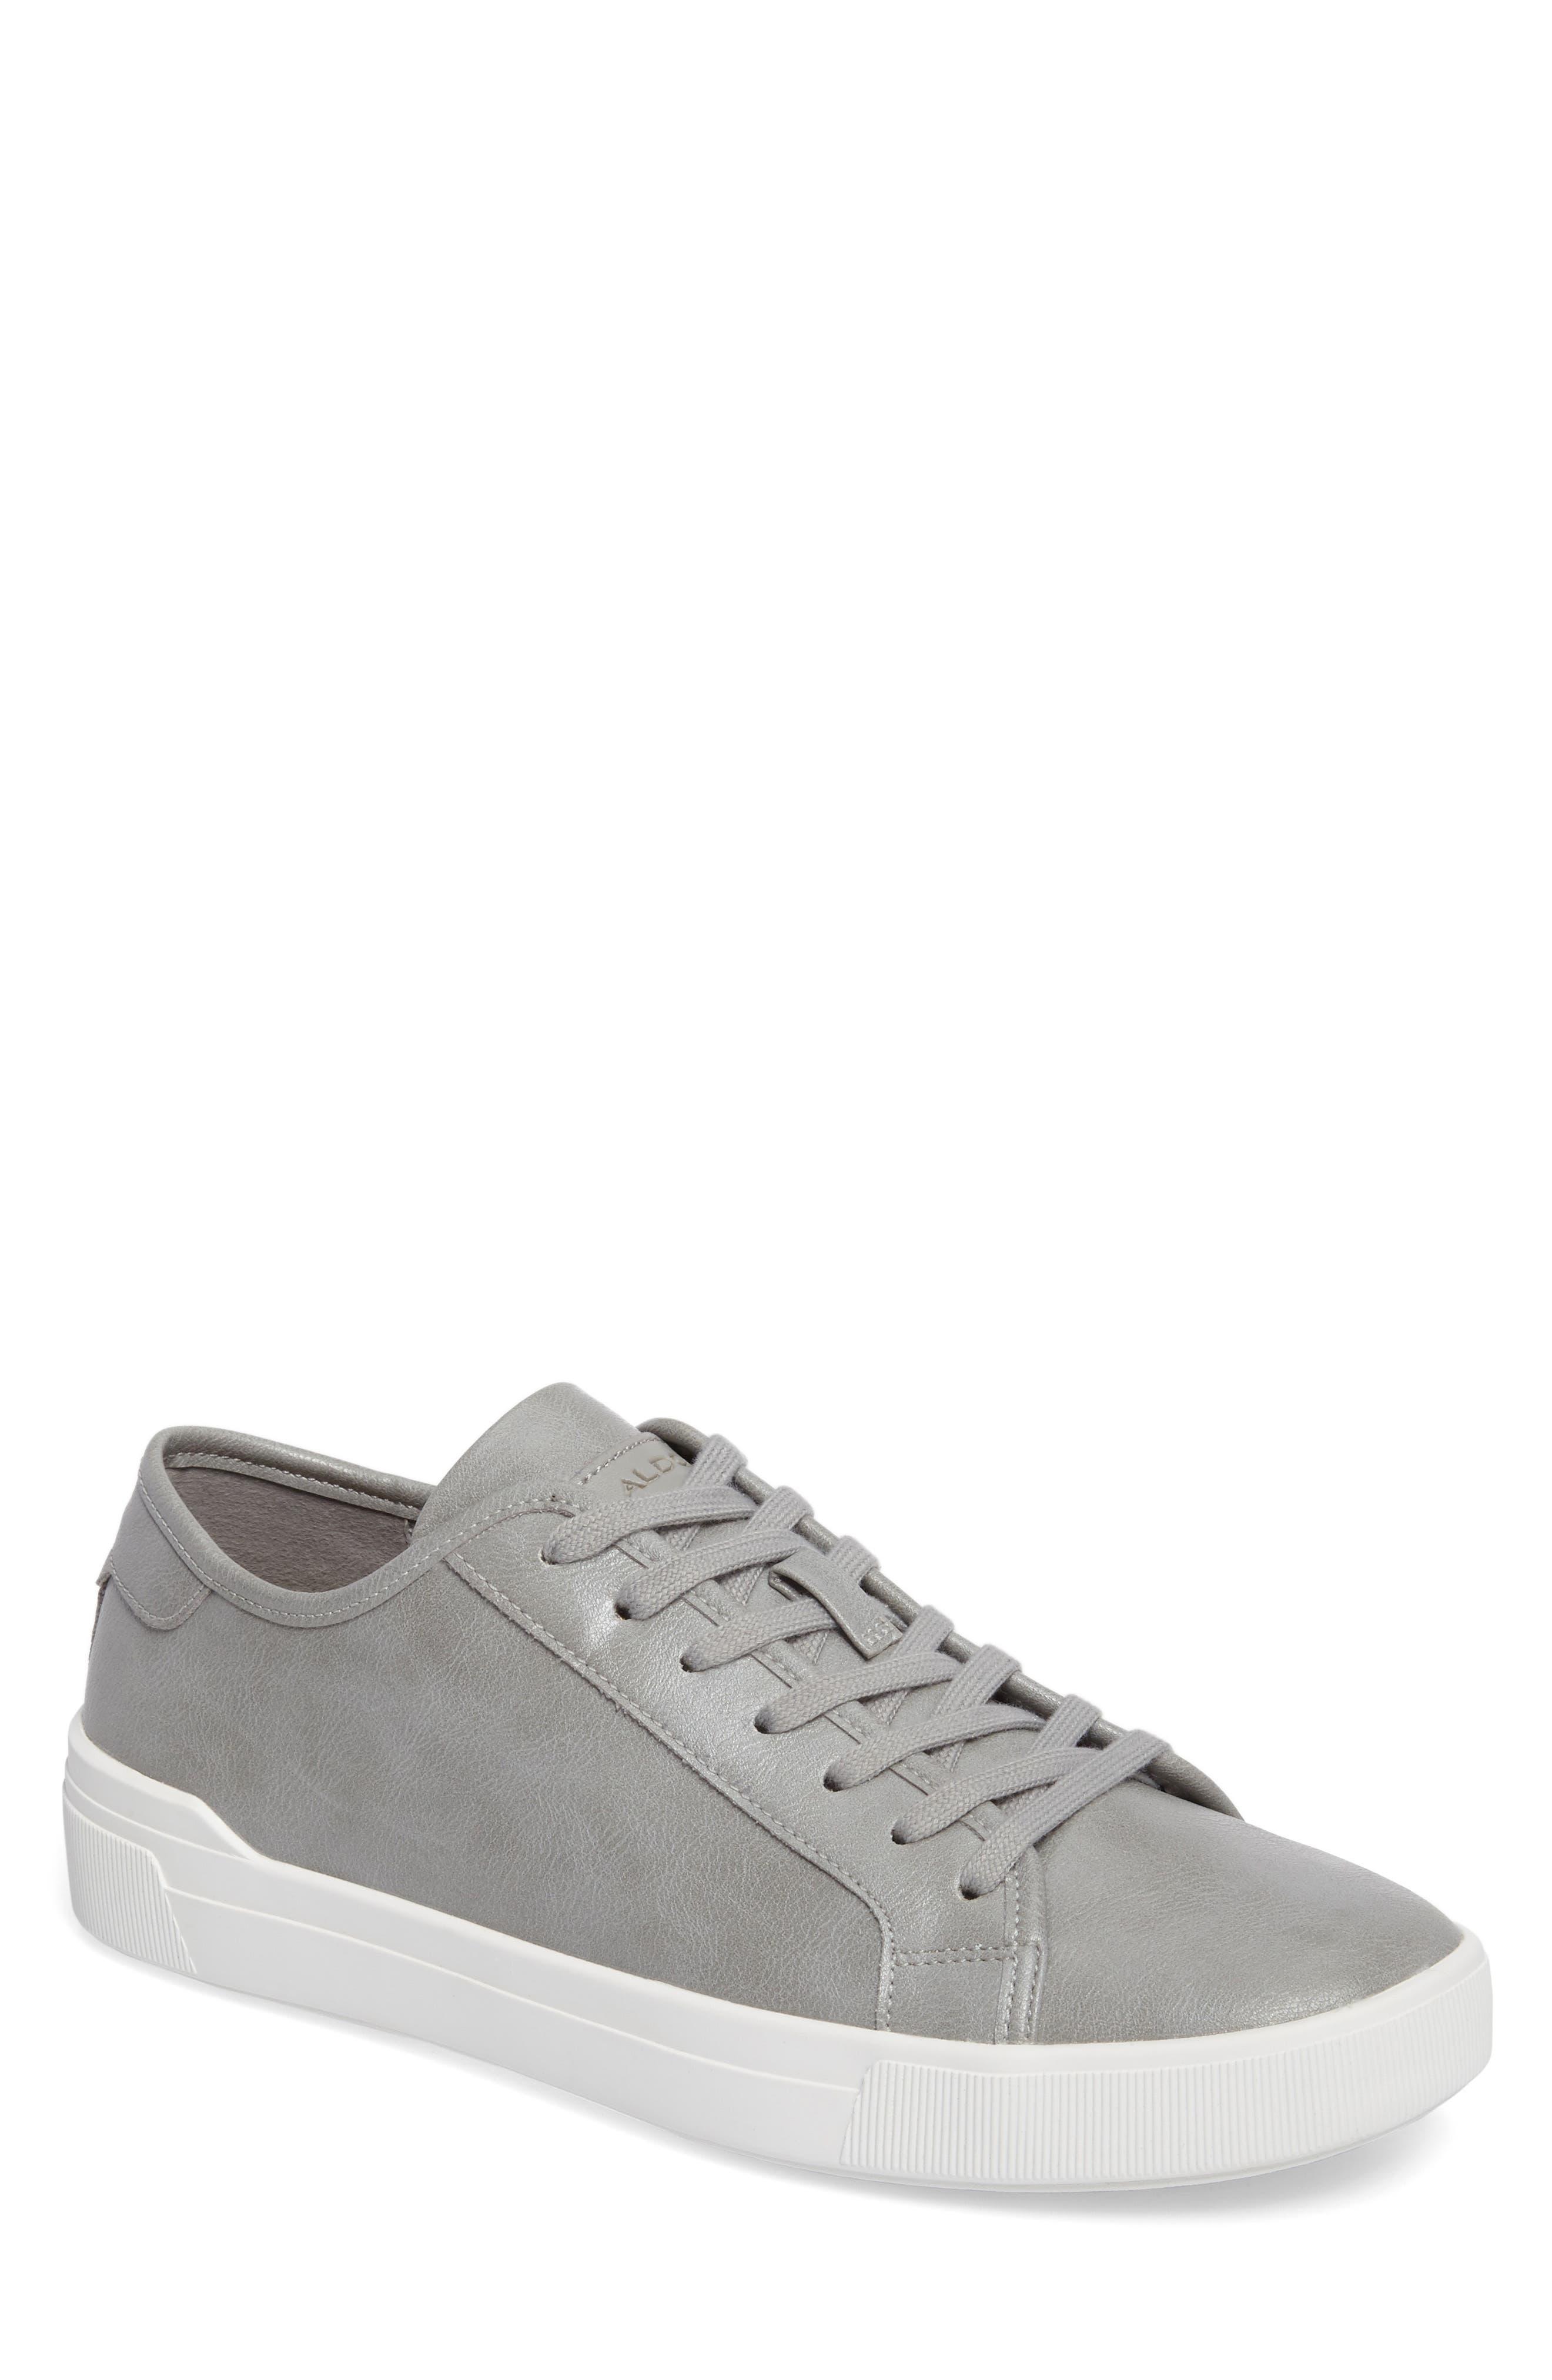 Haener Sneaker,                             Main thumbnail 1, color,                             Medium Grey